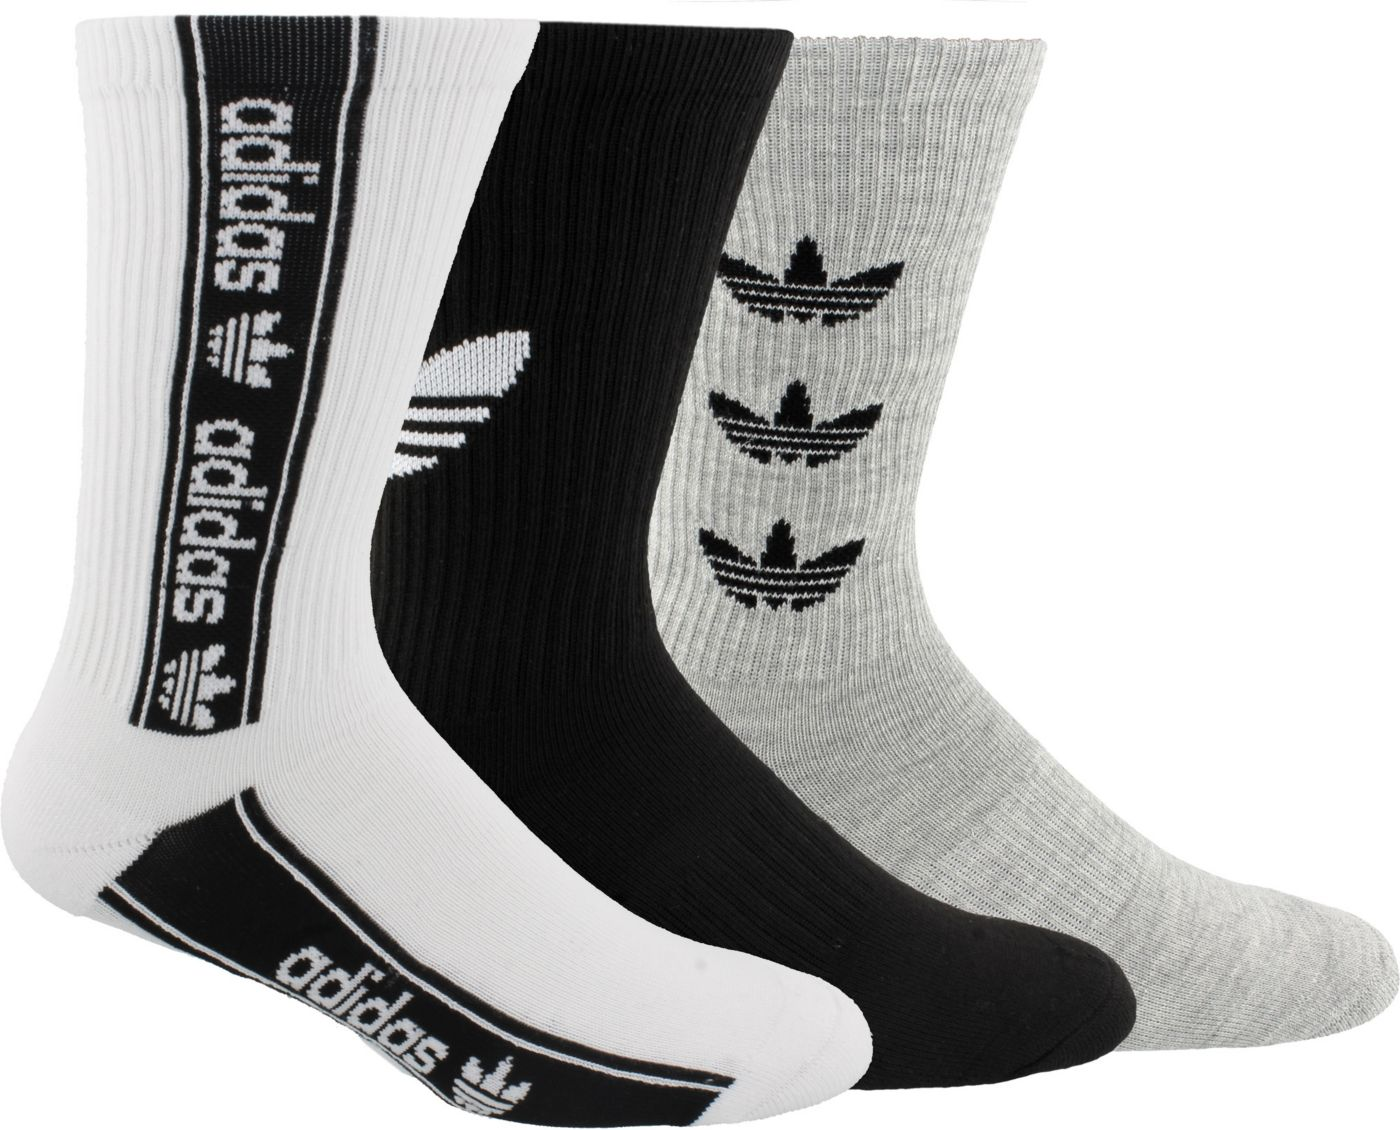 adidas Originals Men's Triple Branded Crew Socks - 3 Pack